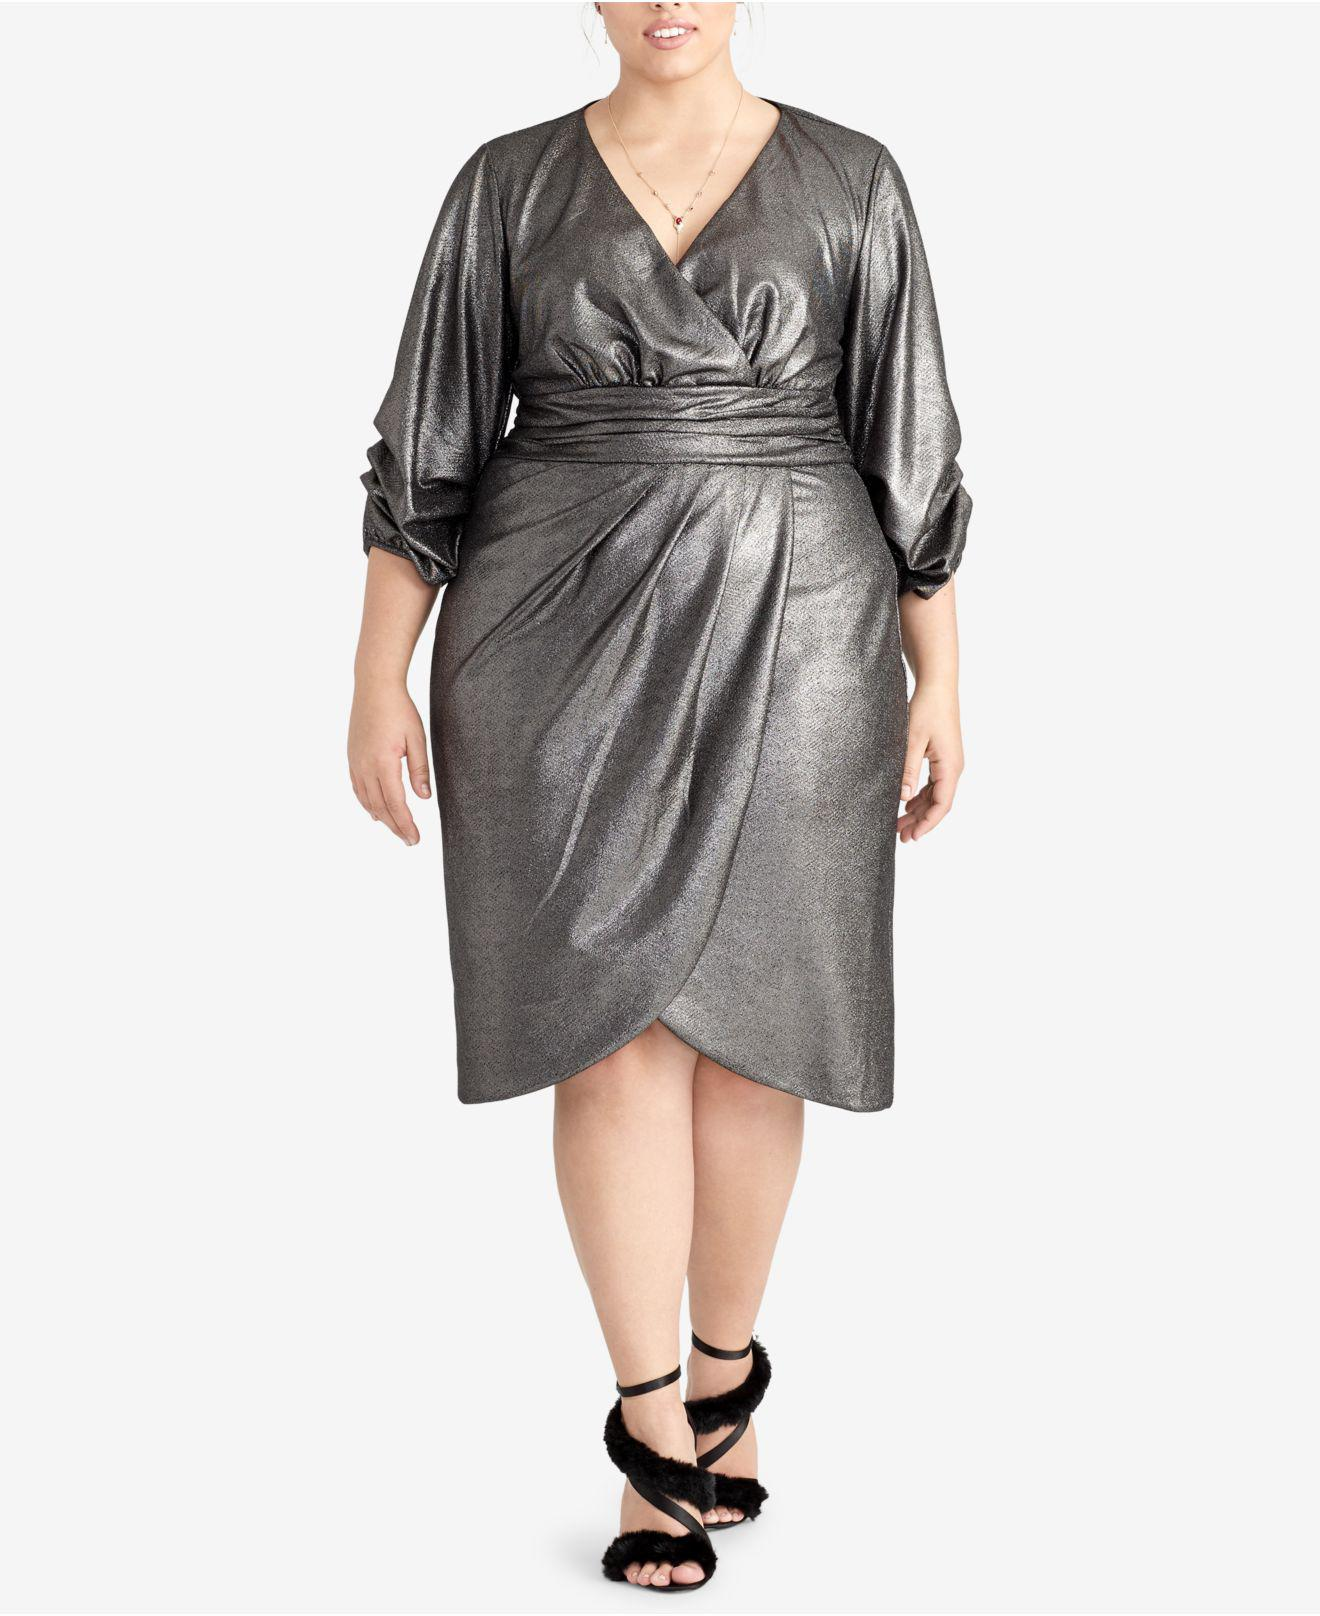 d40a7ed8558 Lyst - RACHEL Rachel Roy Trendy Plus Size Metallic Wrap Dress in ...